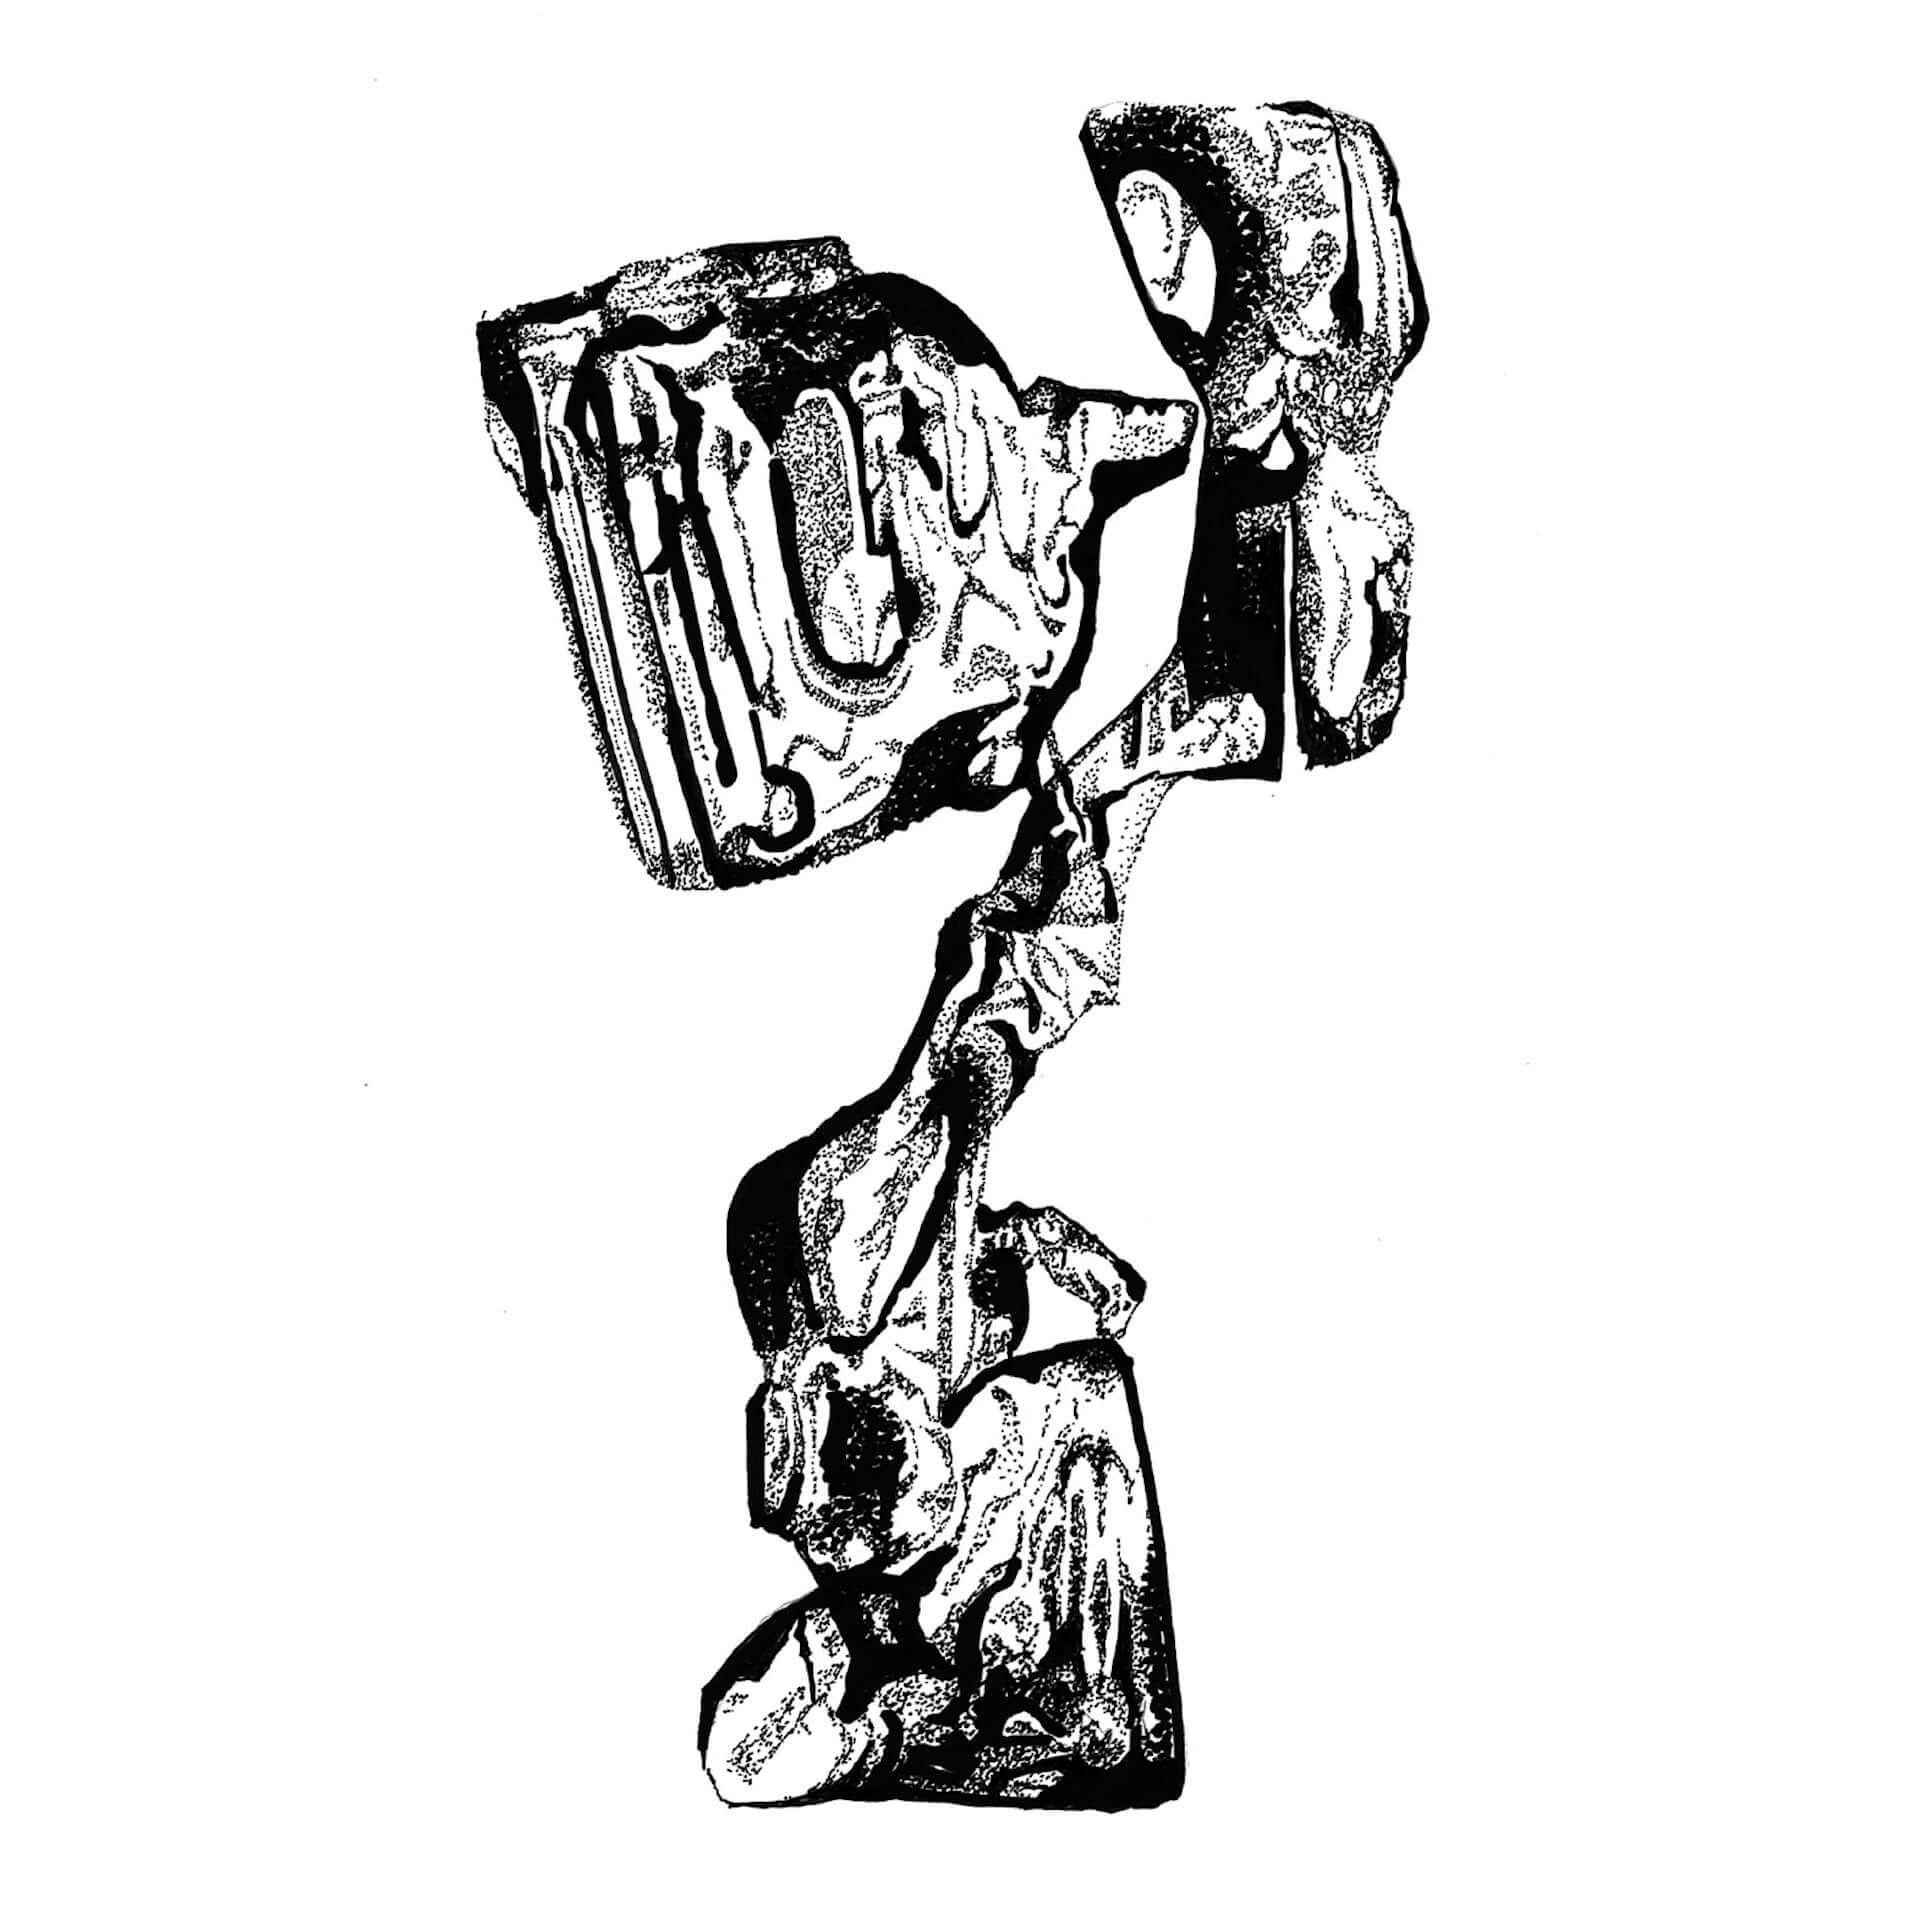 VJ・映像作家としても活躍する悳祐介の個展<DOTS>がLAID BUGにて開催決定!モノクロームの点描画作品を多数展示 art210304_yusuke-isao_20-1920x1919